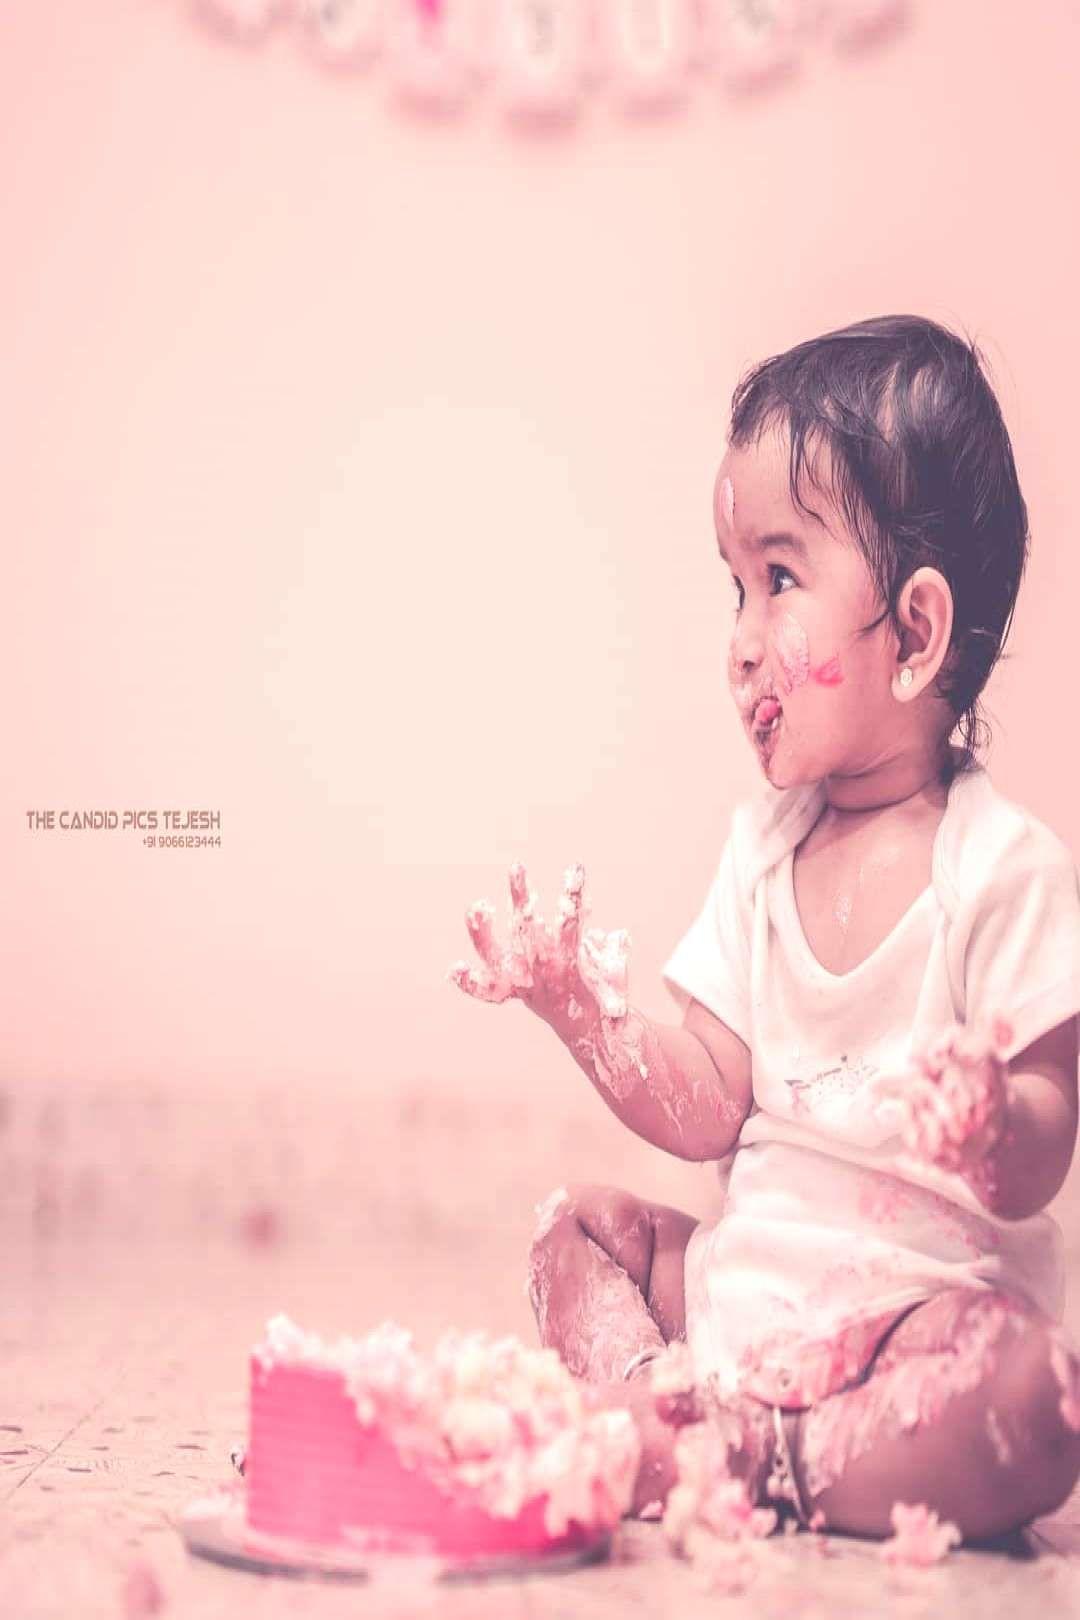 #kidsofinstagram #kidzfashion #kidsworld #babykiss #person #smaya #baby #kidz #ba #1 Baby SMAYA kidsofinstagram kidzfashion kidz kidsworld babykiss baYou can find Kidsworld and more on our website.Baby SMAYA kidsofinstagram kidzfas...